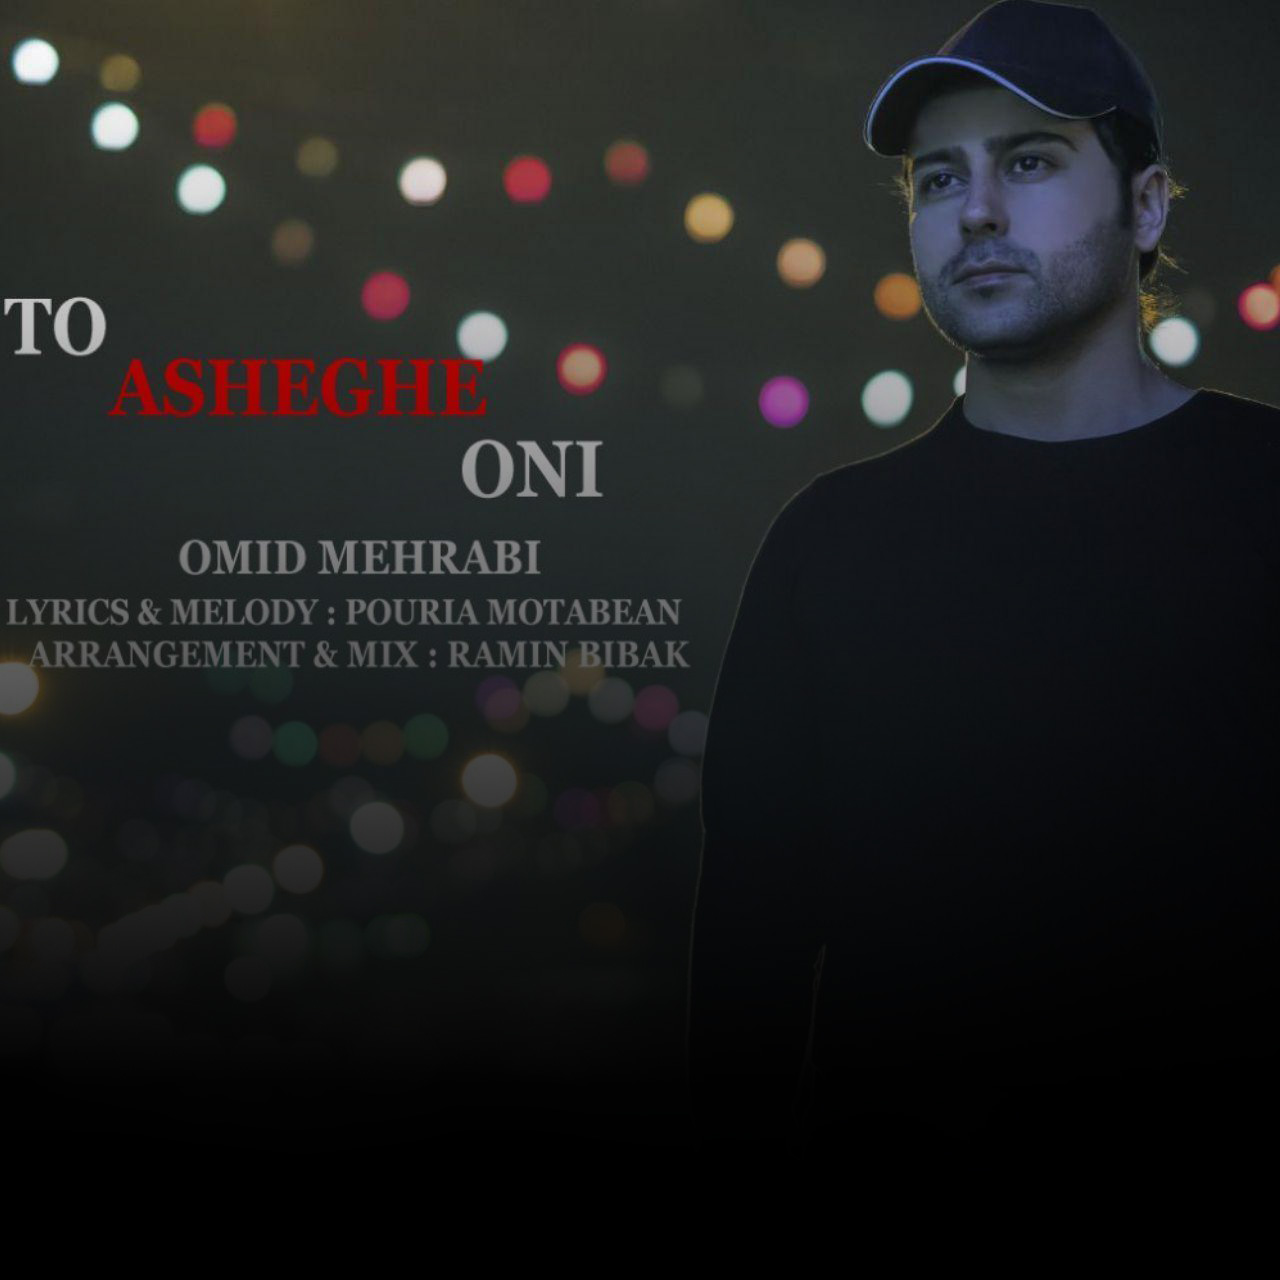 Omid Mehrabi - To Asheghe Oni Music | آهنگ امید محرابی - تو عاشق اونی